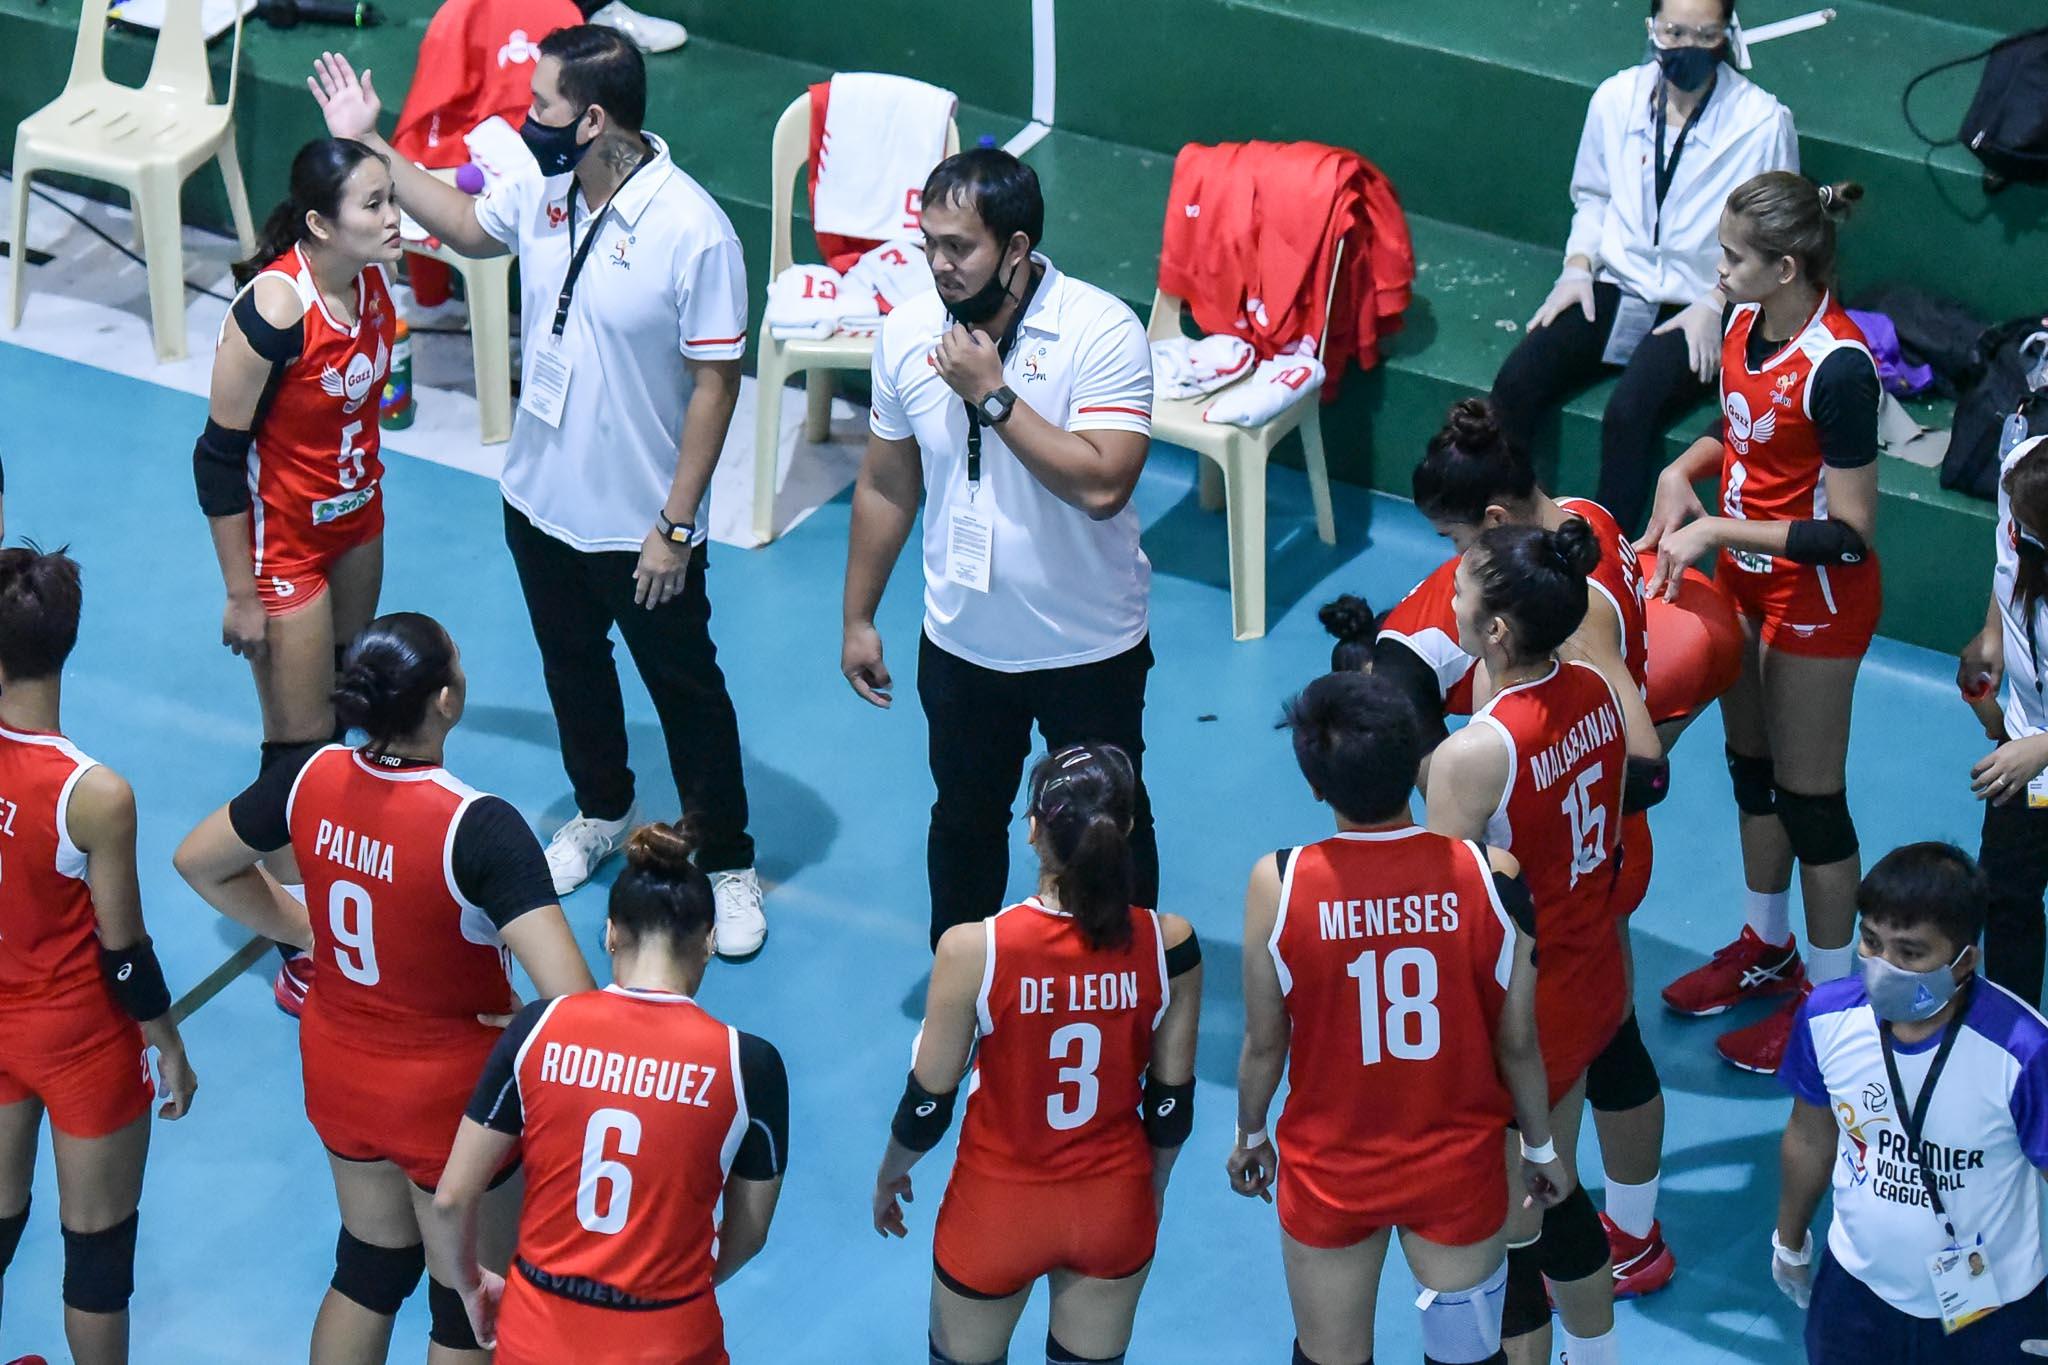 2021-PVL-Open-Petro-Gazz-vs.-Chery-Tiggo-Coach-Arnold-Laniog-3917 Velez, Laniog glad to see each other thrive in PVL News PVL Volleyball  - philippine sports news